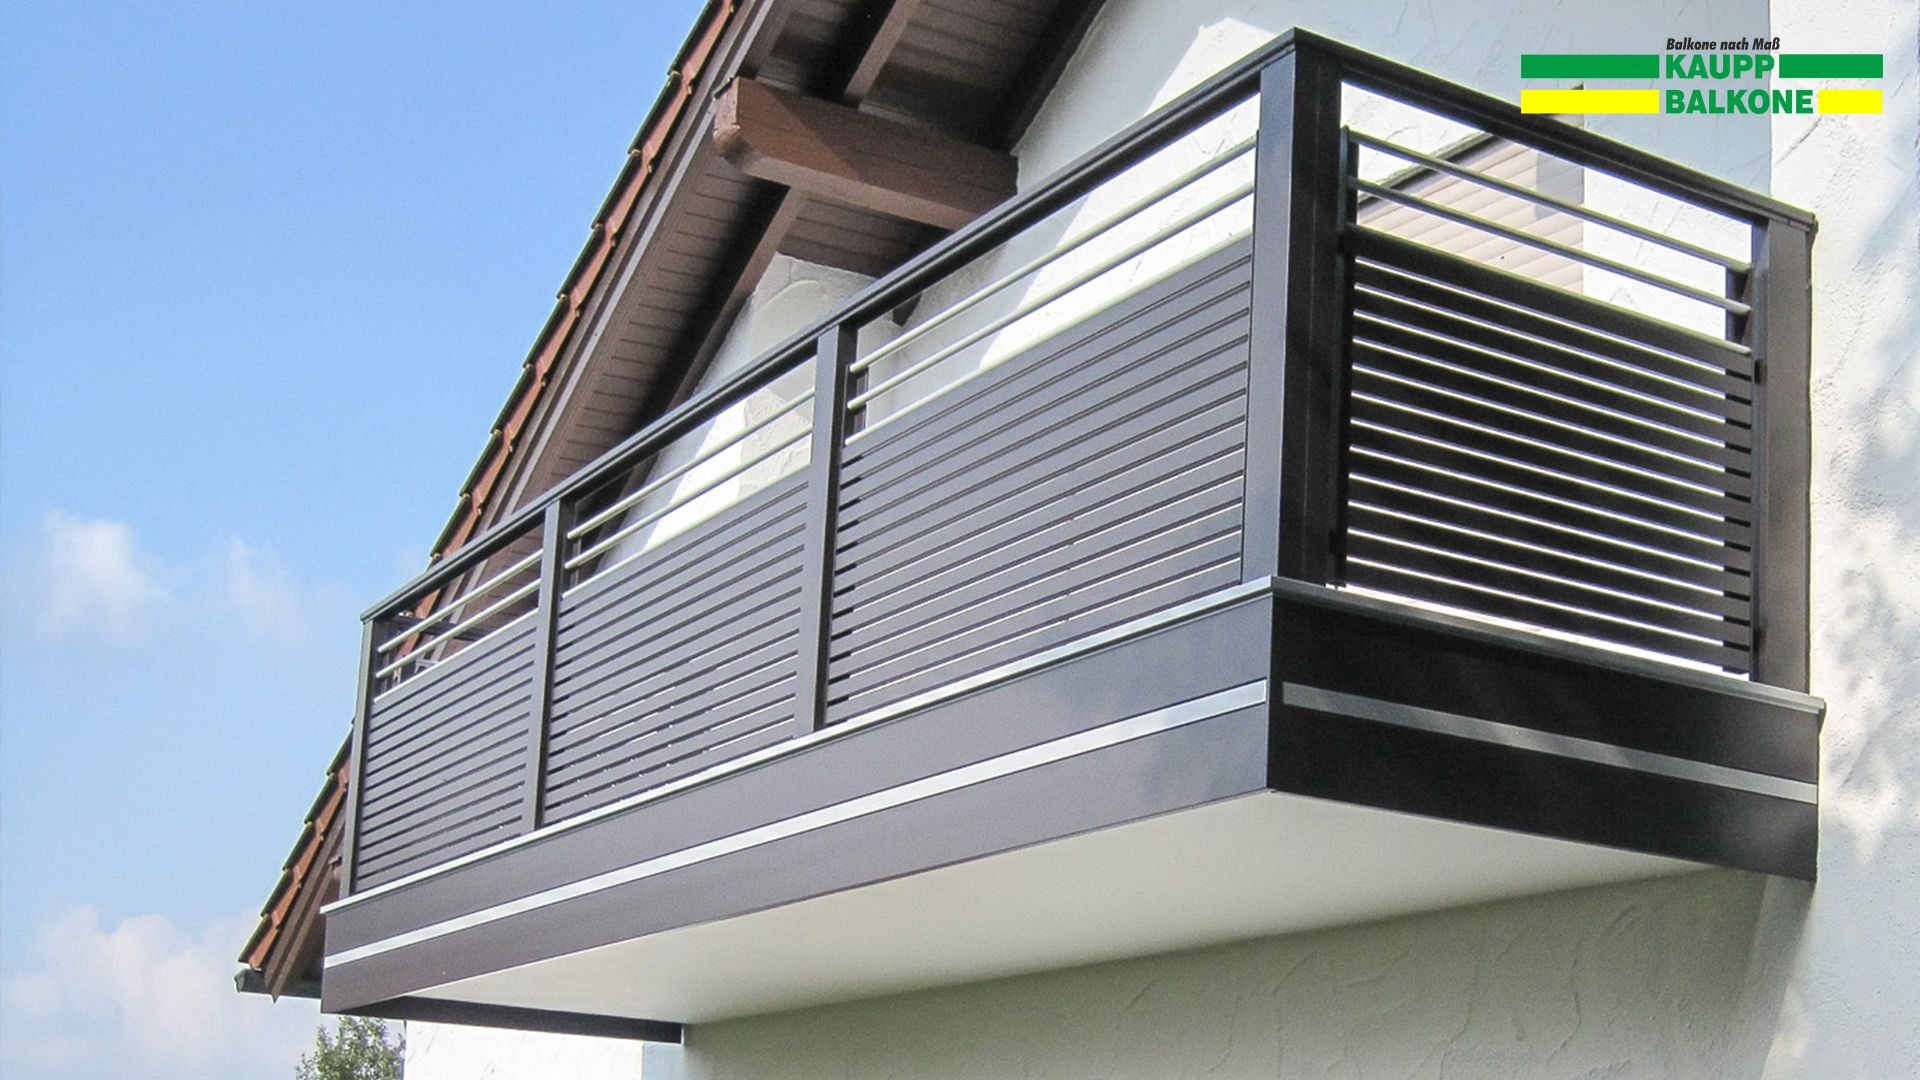 bildergebnis f r balkongel nder balkongel nder. Black Bedroom Furniture Sets. Home Design Ideas